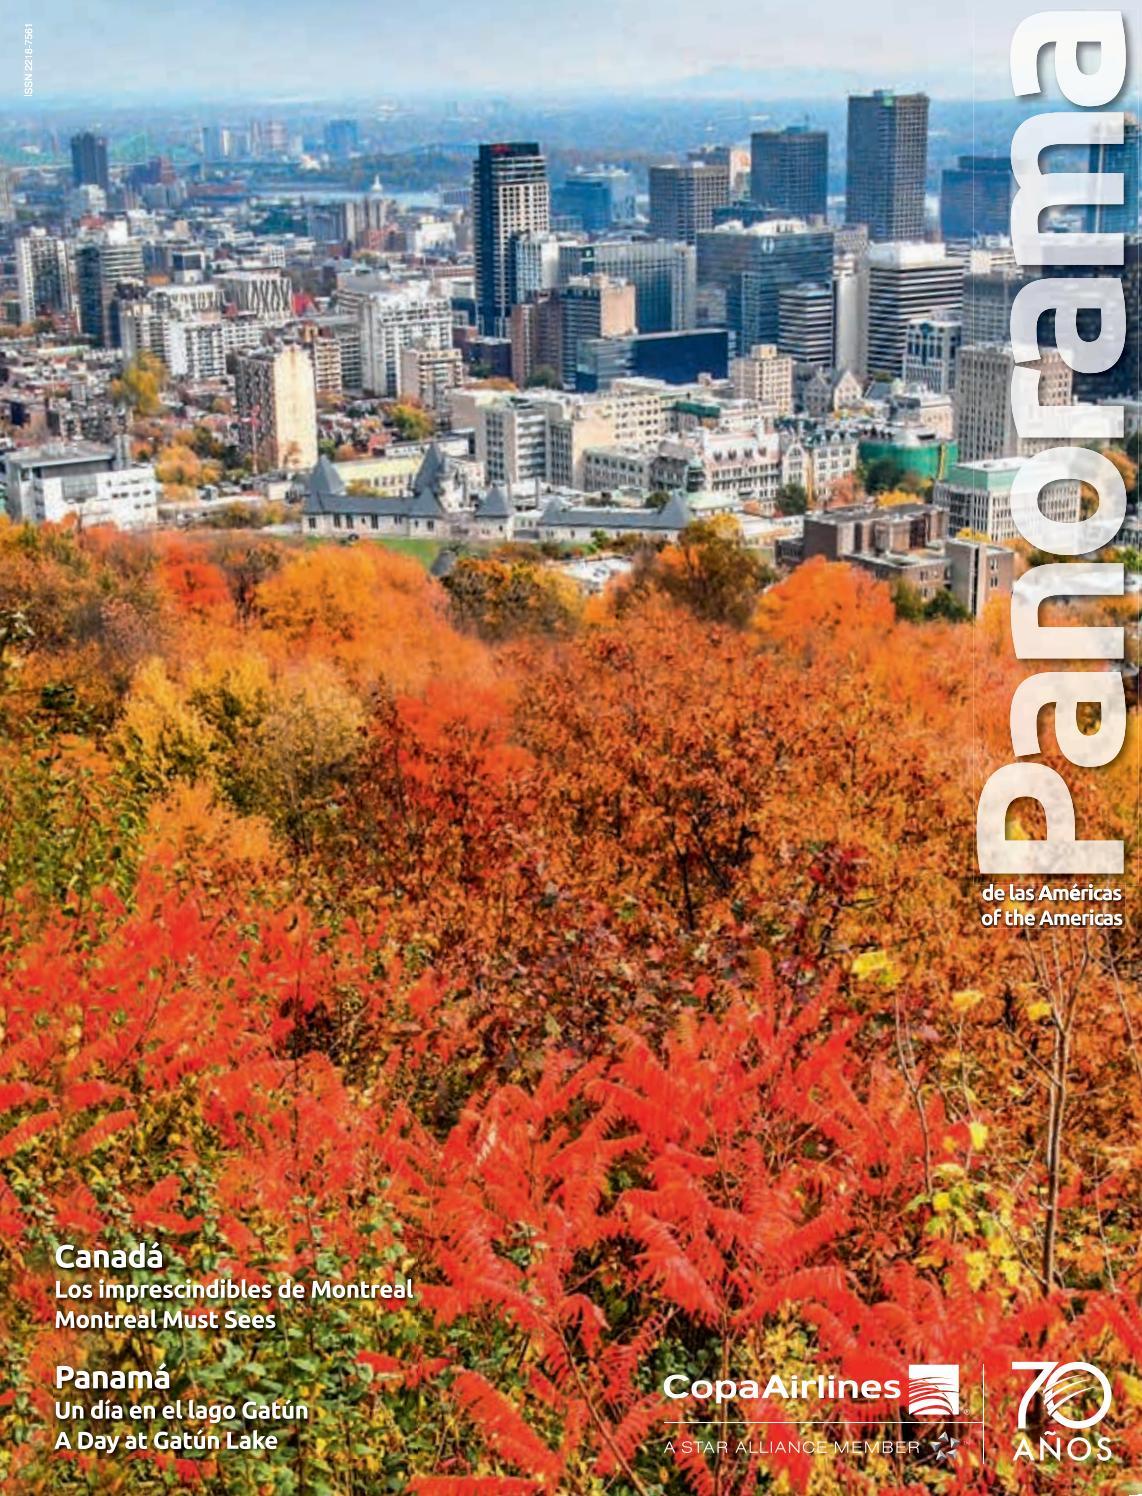 Revista Panorama Marzo 2018 by azurecom - issuu